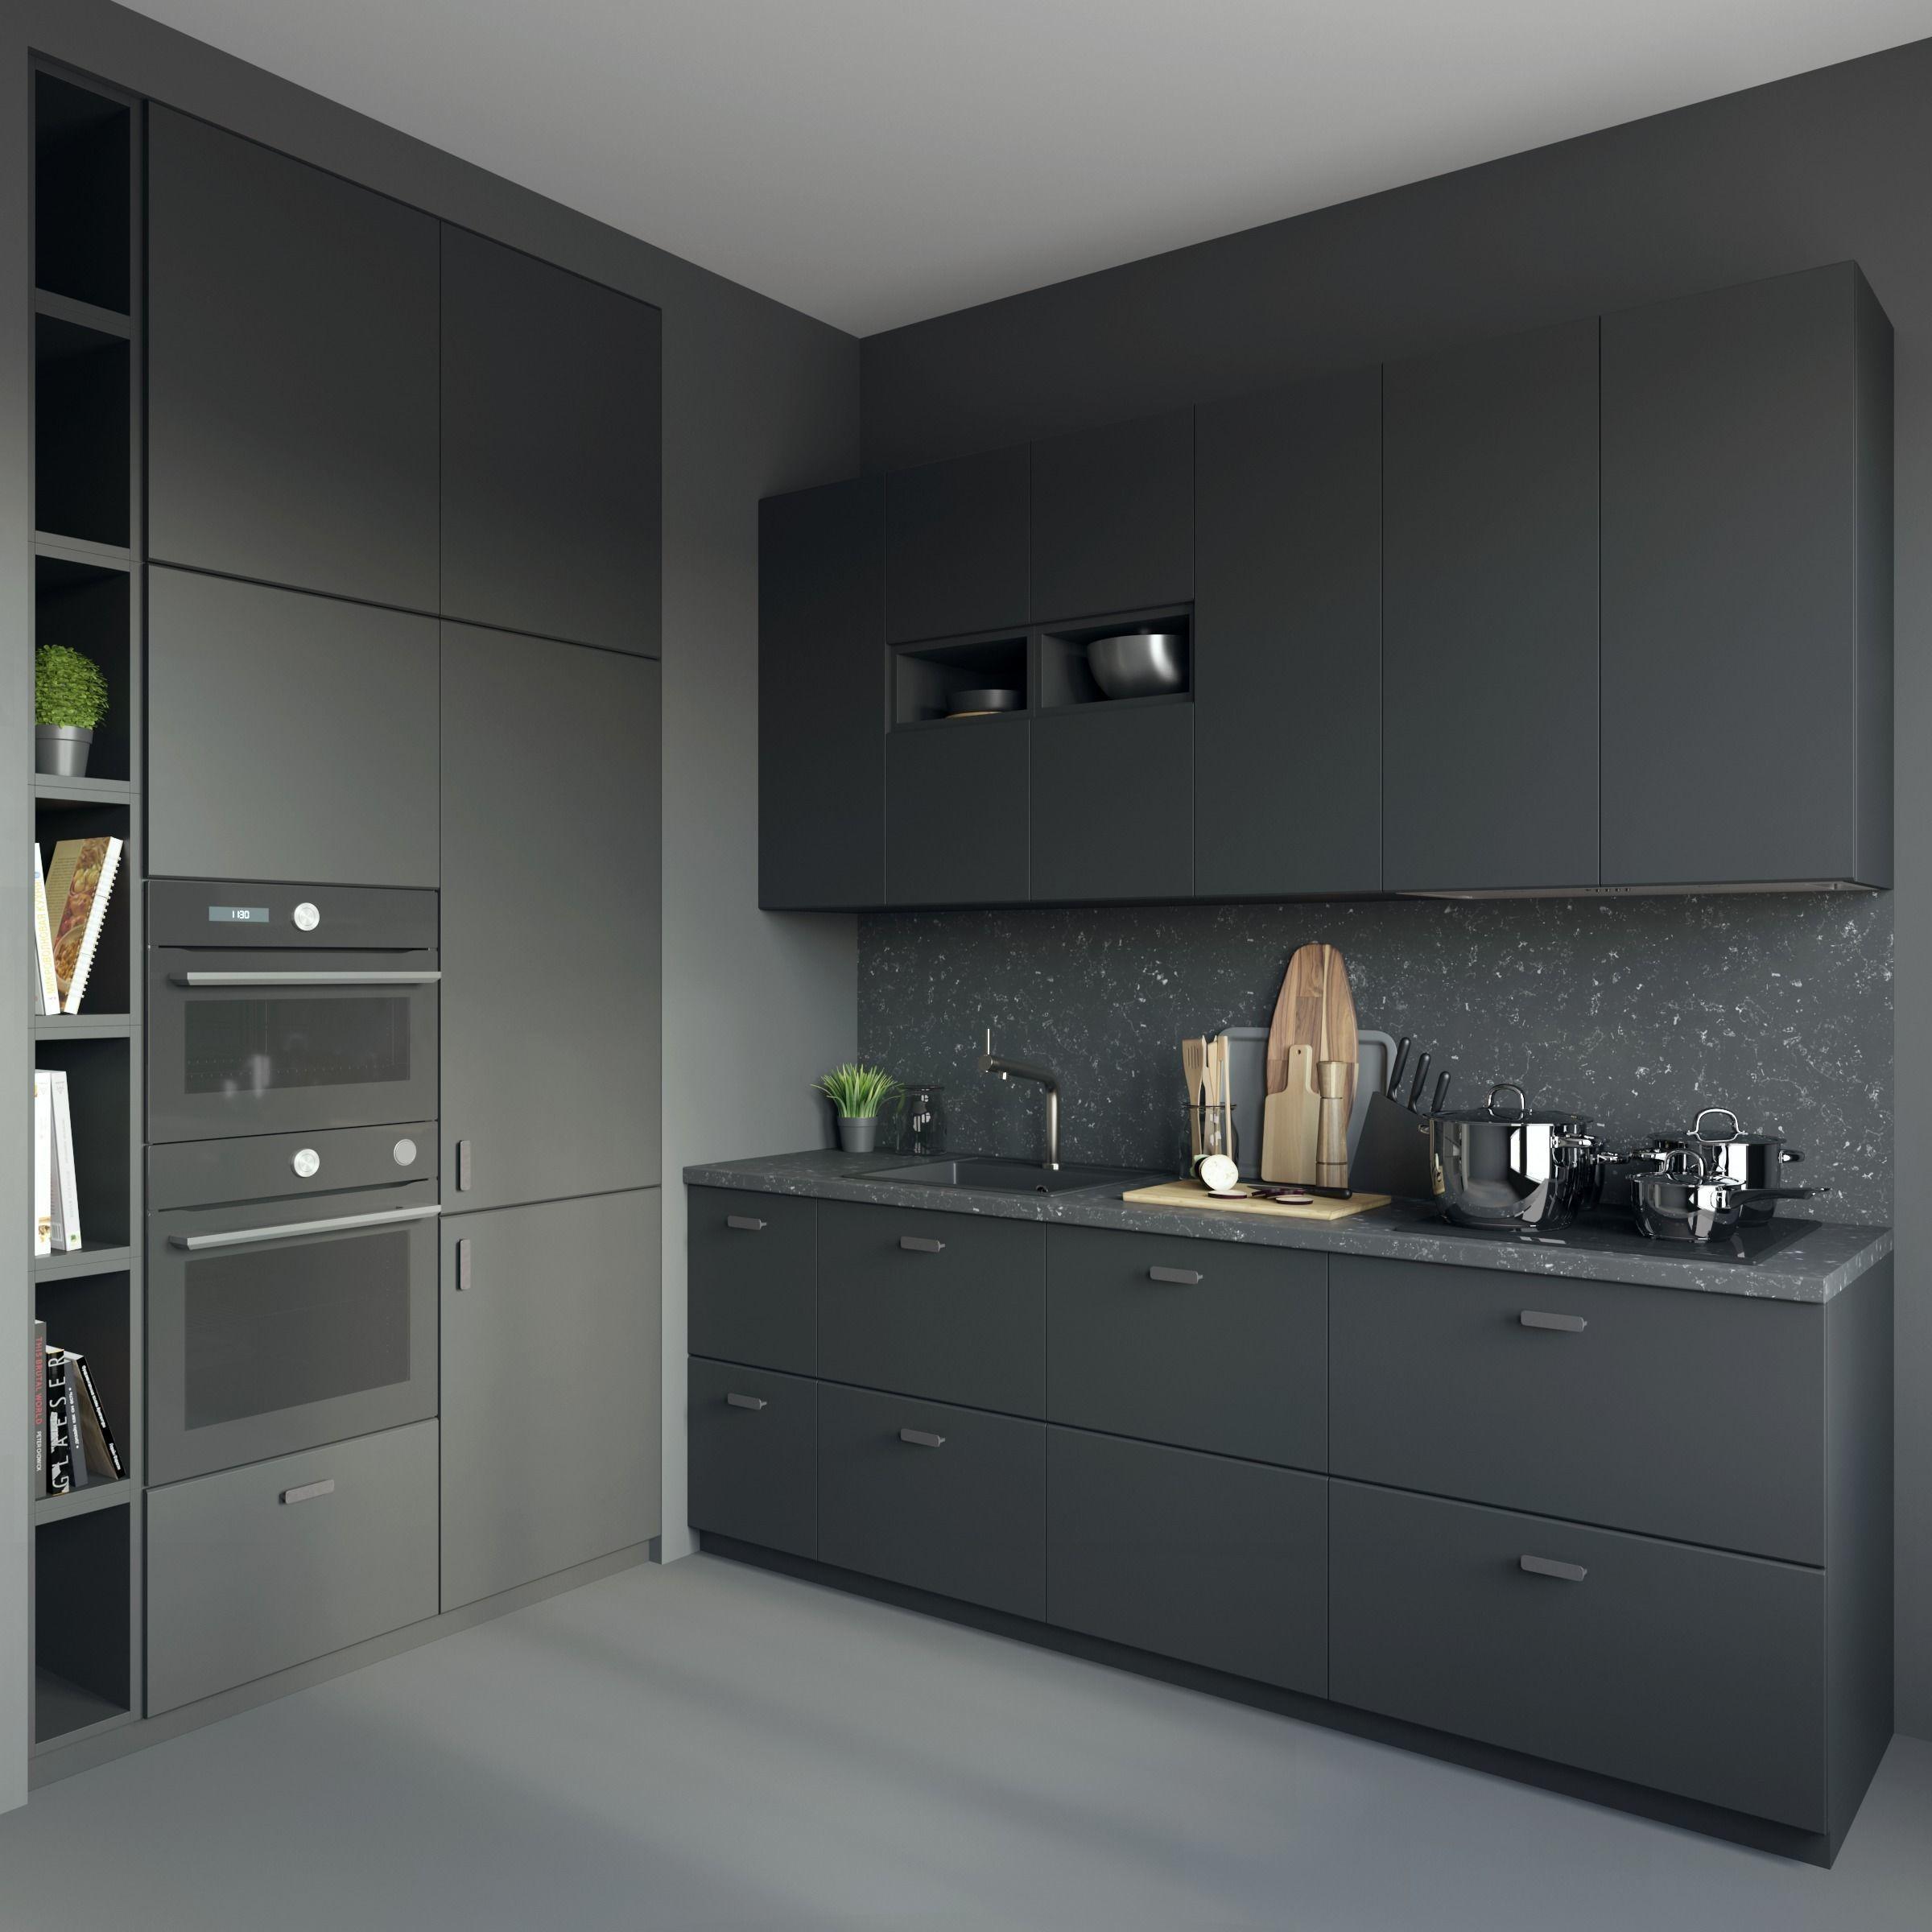 Kitchen ikea kungsbacka 3d model cgtrader - Ikea kitchen designer los angeles ...